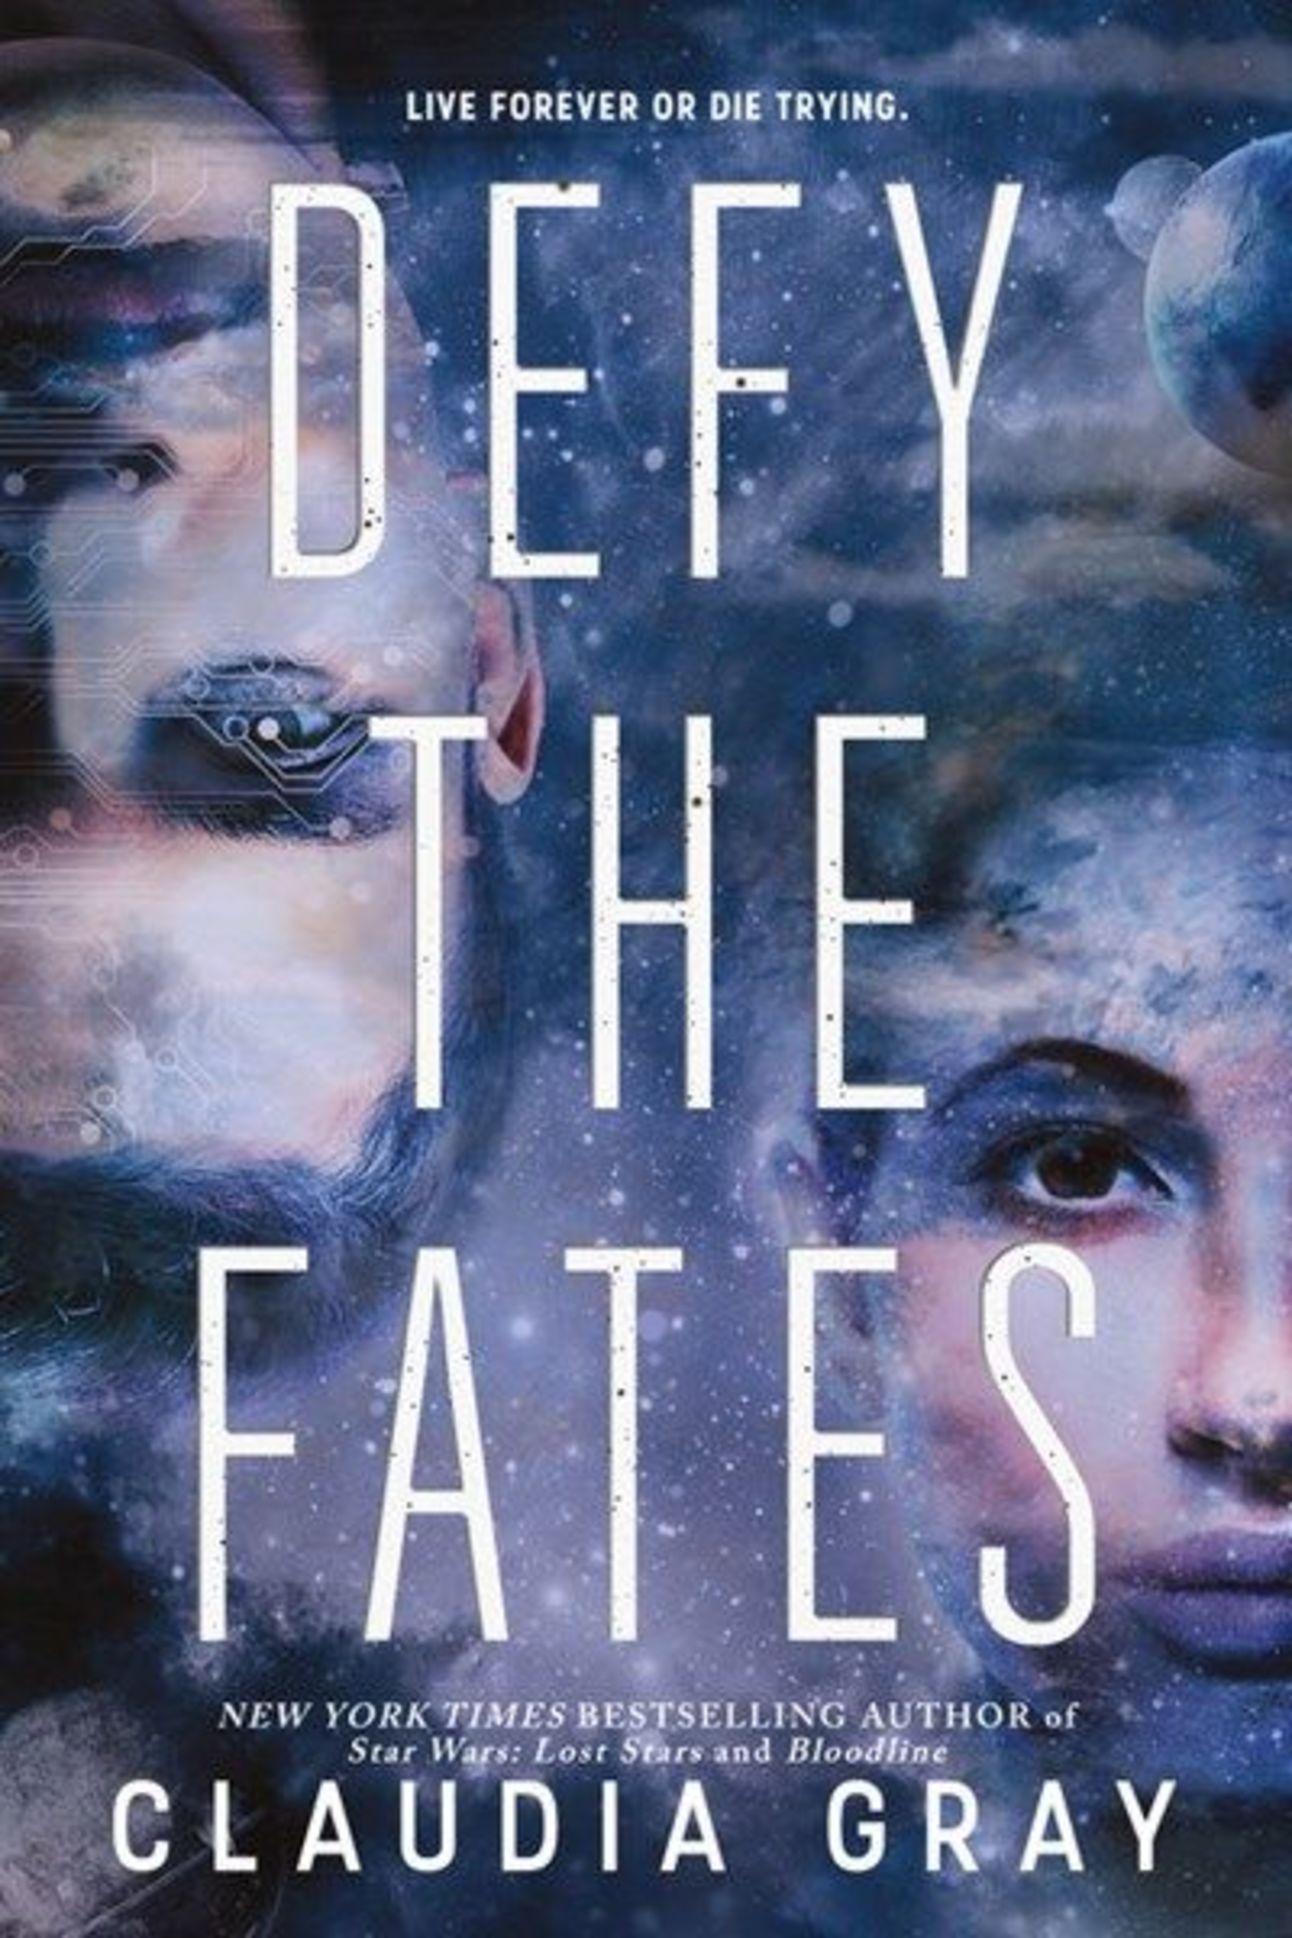 defy-fates